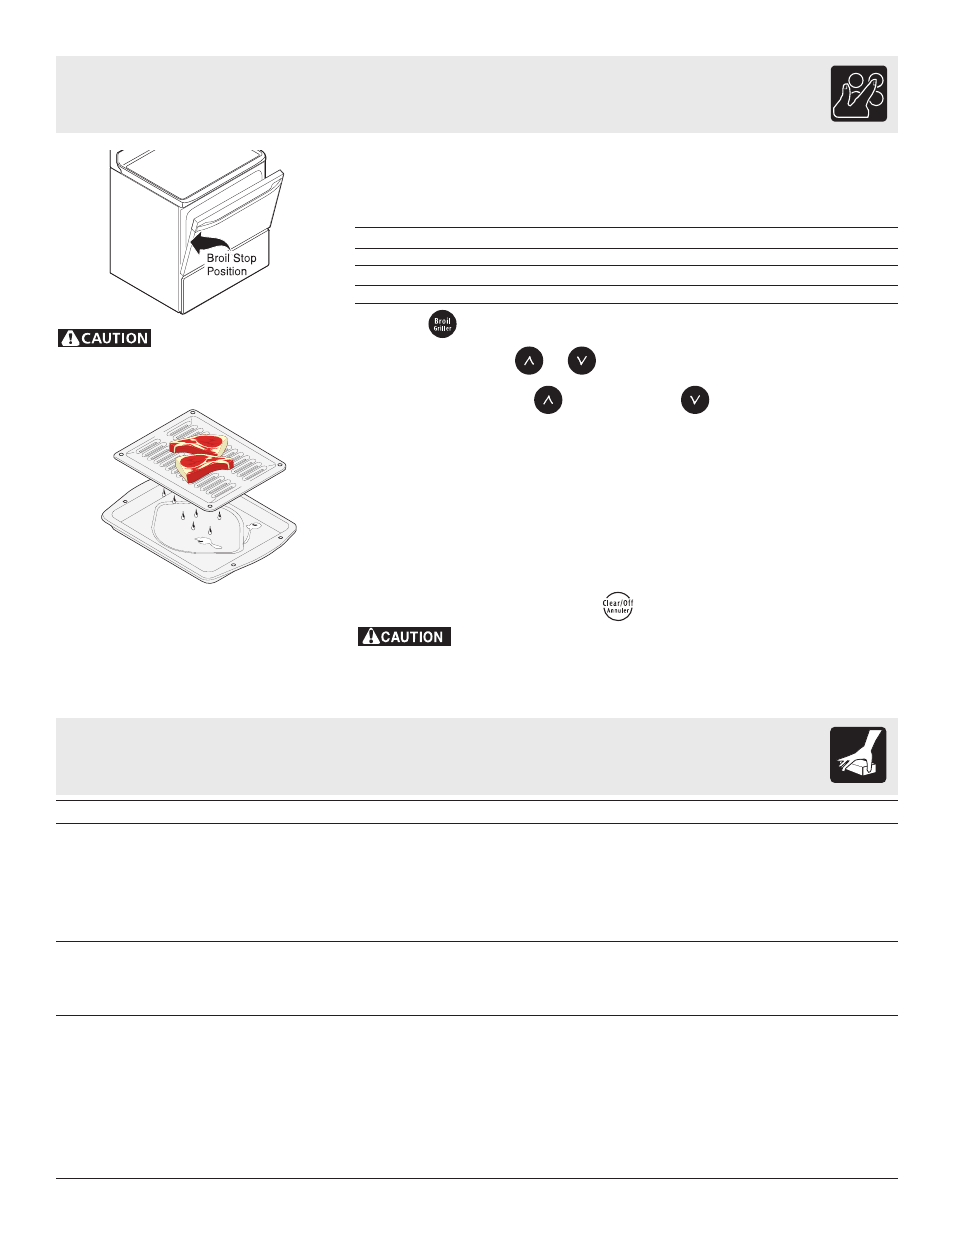 setting oven controls general care cleaning frigidaire es100 rh manualsdir com DGGF3042KF Frigidaire Griddle Frigidaire Jbnd 28